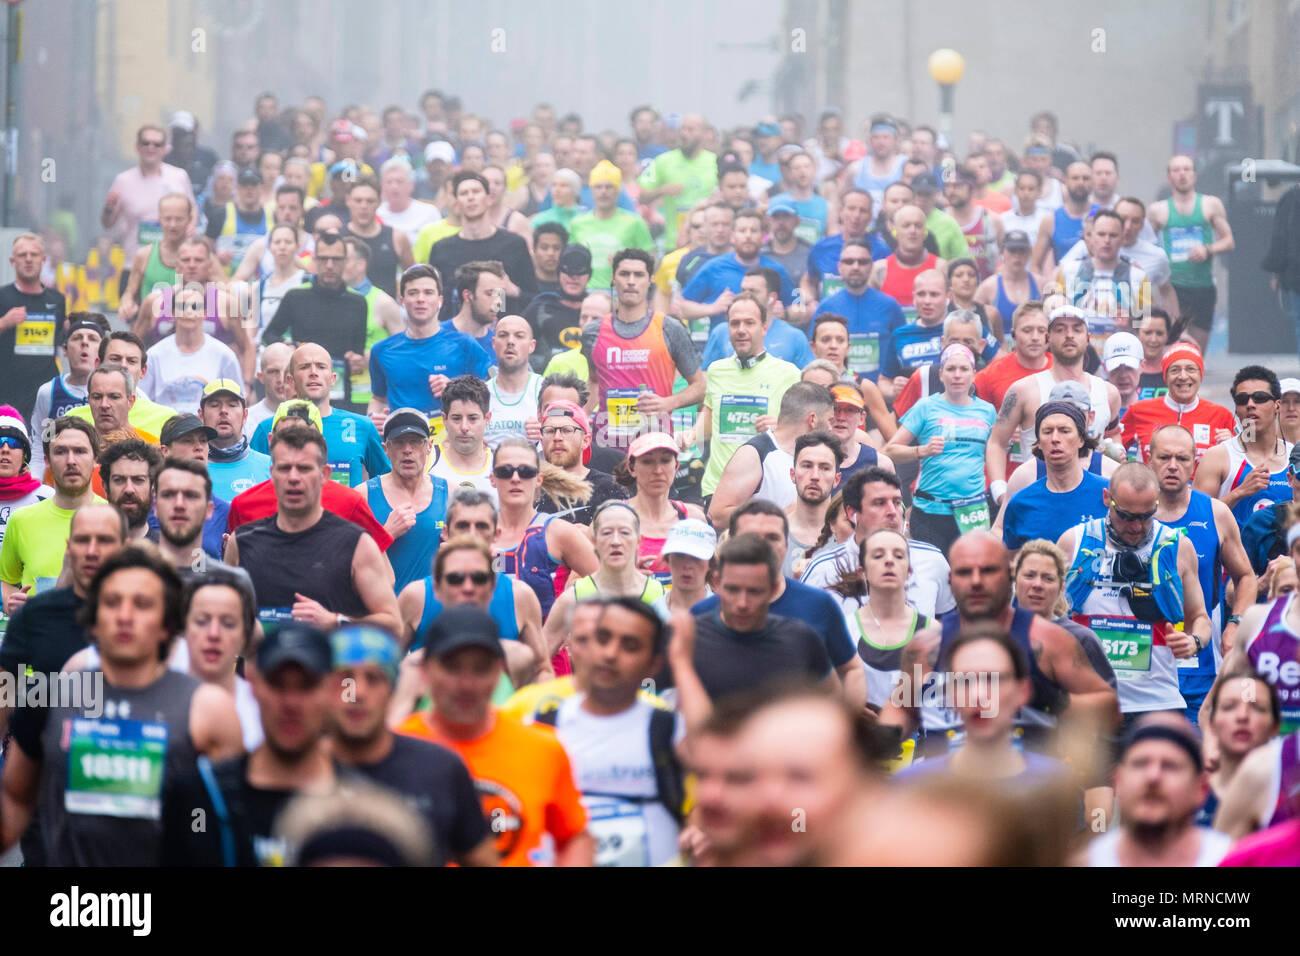 Edinburgh, Scotland, UK. 27 May, 2018. Runners make their way down the Royal Mile towards the Scottish Parliament Building at Holyrood during the Edinburgh Marathon 2018 Credit: Iain Masterton/Alamy Live News - Stock Image